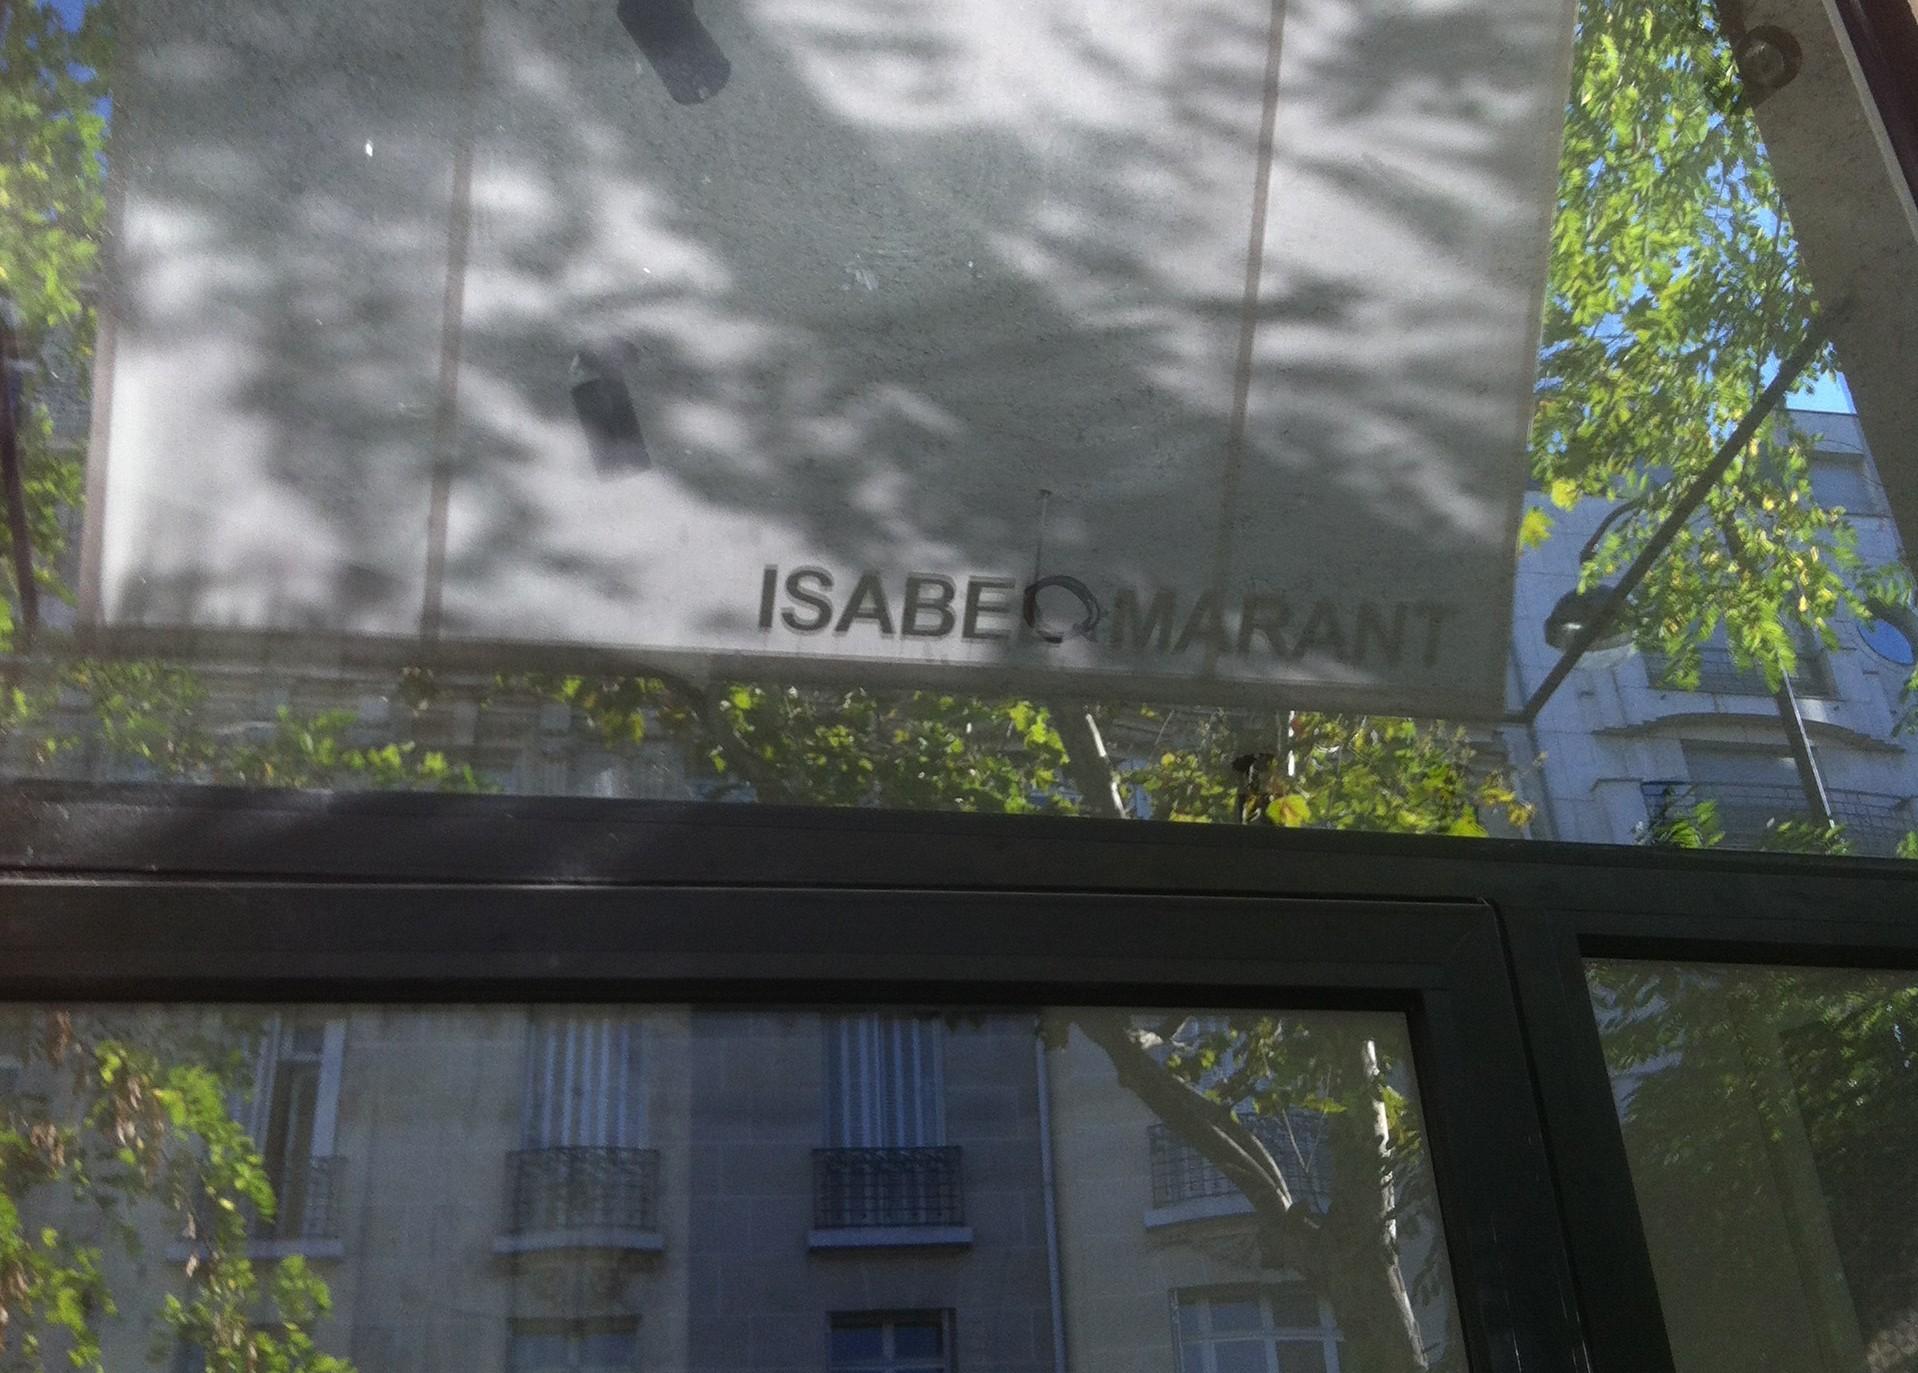 IMG 28681 e1352674358898 Cabines dessayage Isabel Marant // Ciguë